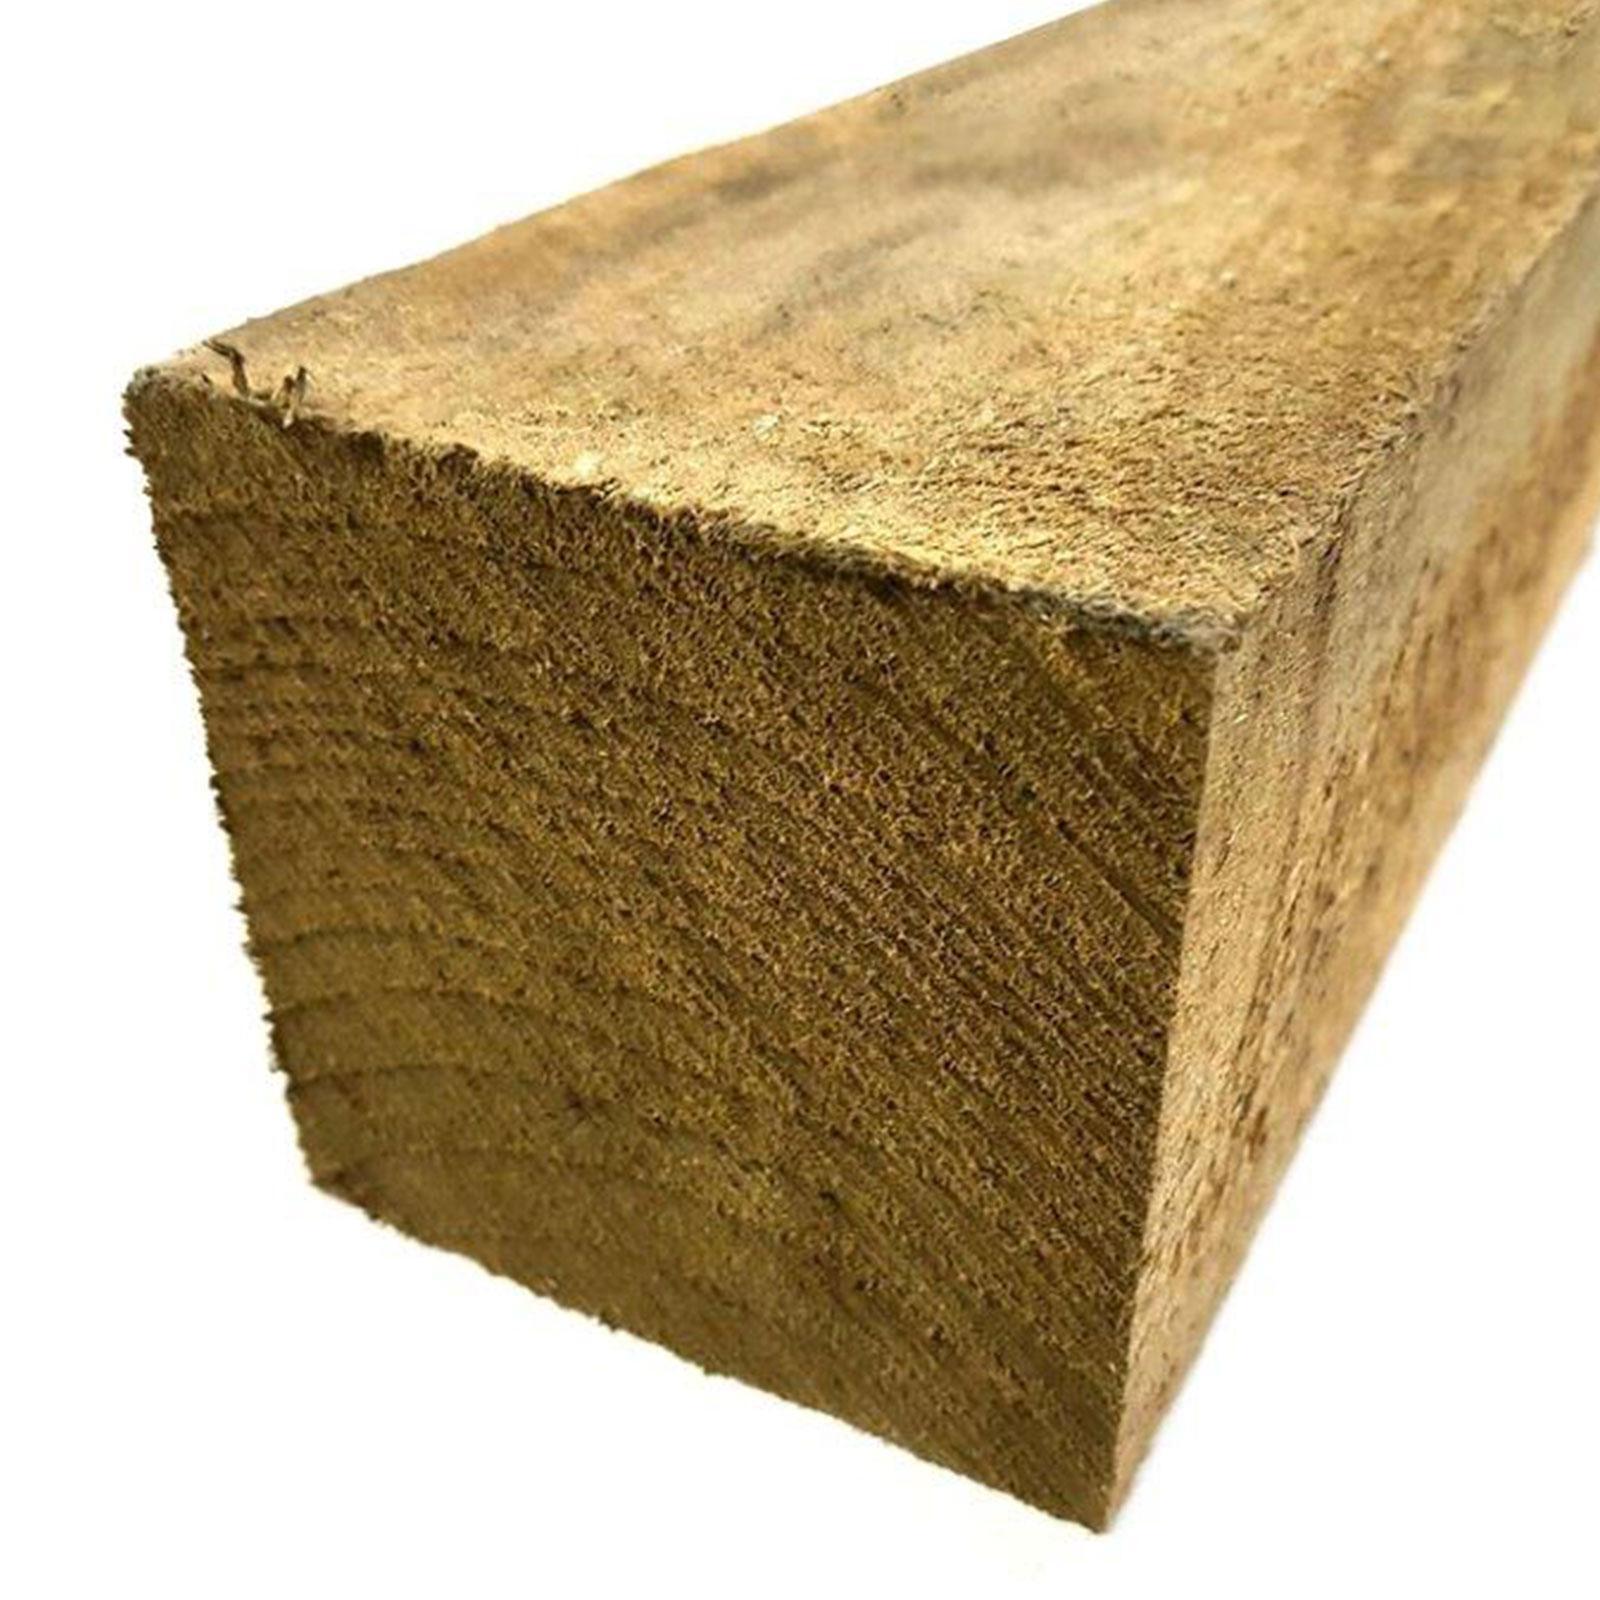 100 x 100mm Rough Sawn Treated Pine - 2.4m